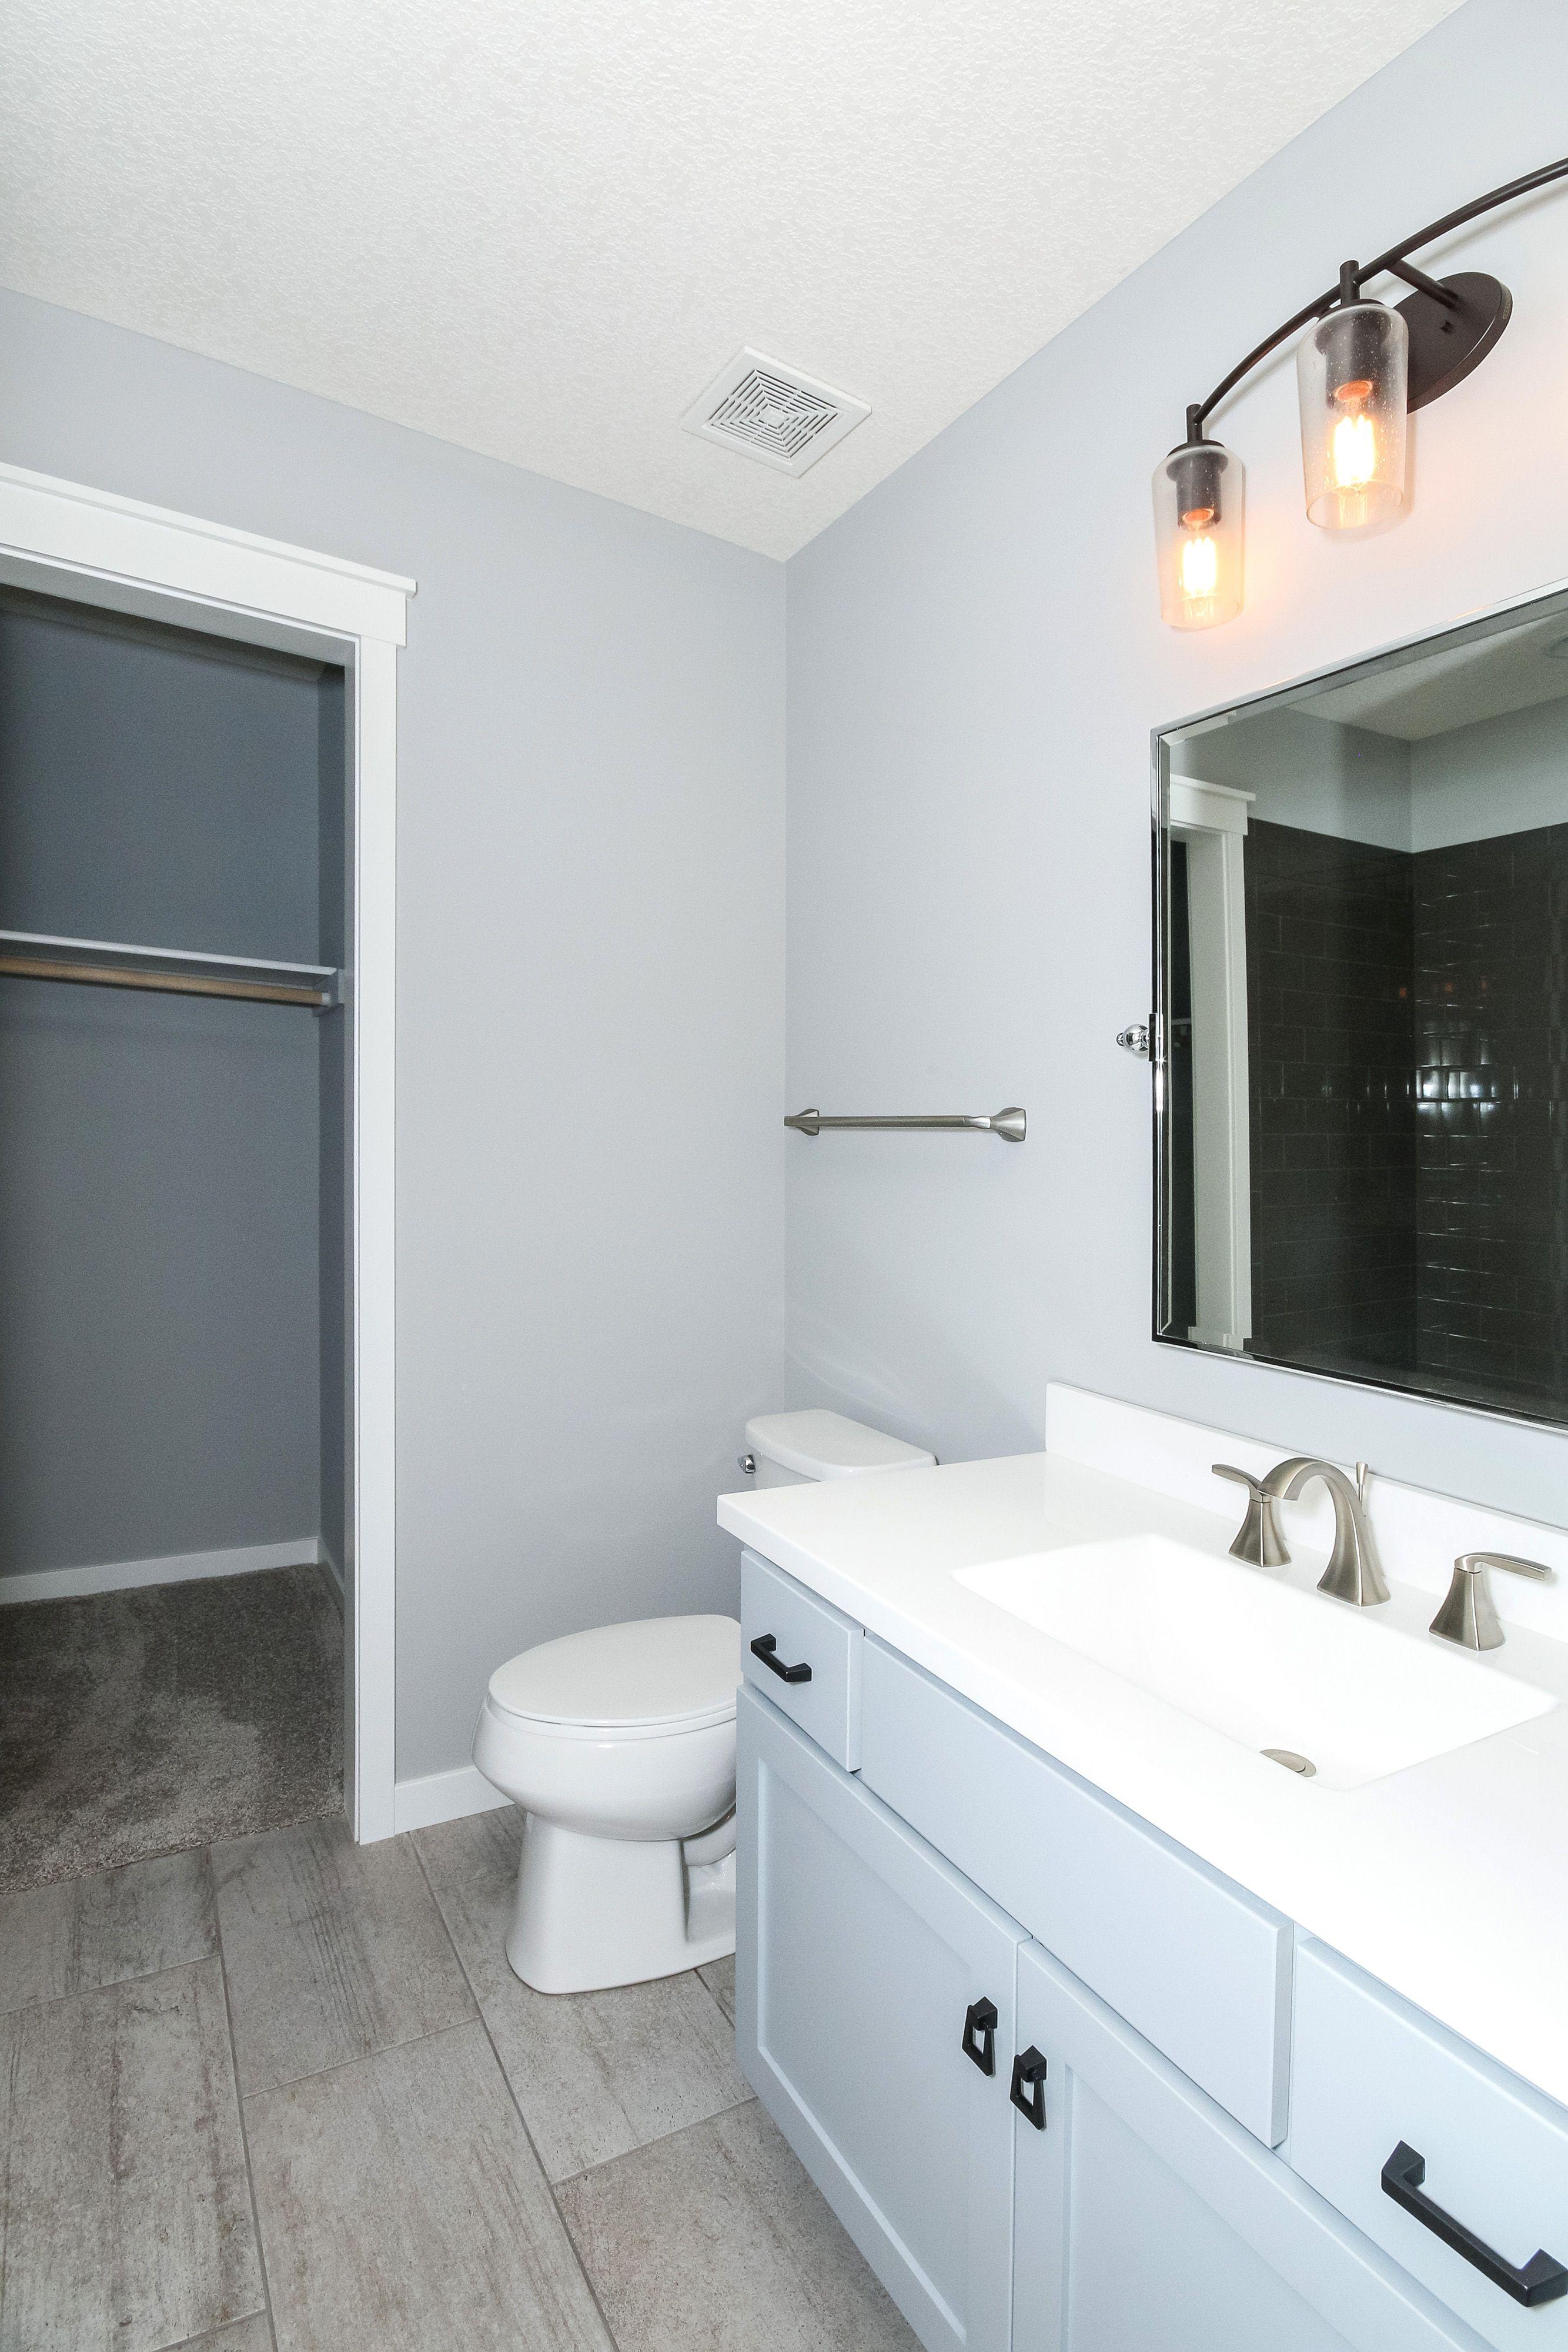 Sherwin williams popular greys - Bedroom 4 Bath Walls Sherwin Williams Sw 0055 Light French Grey Trim